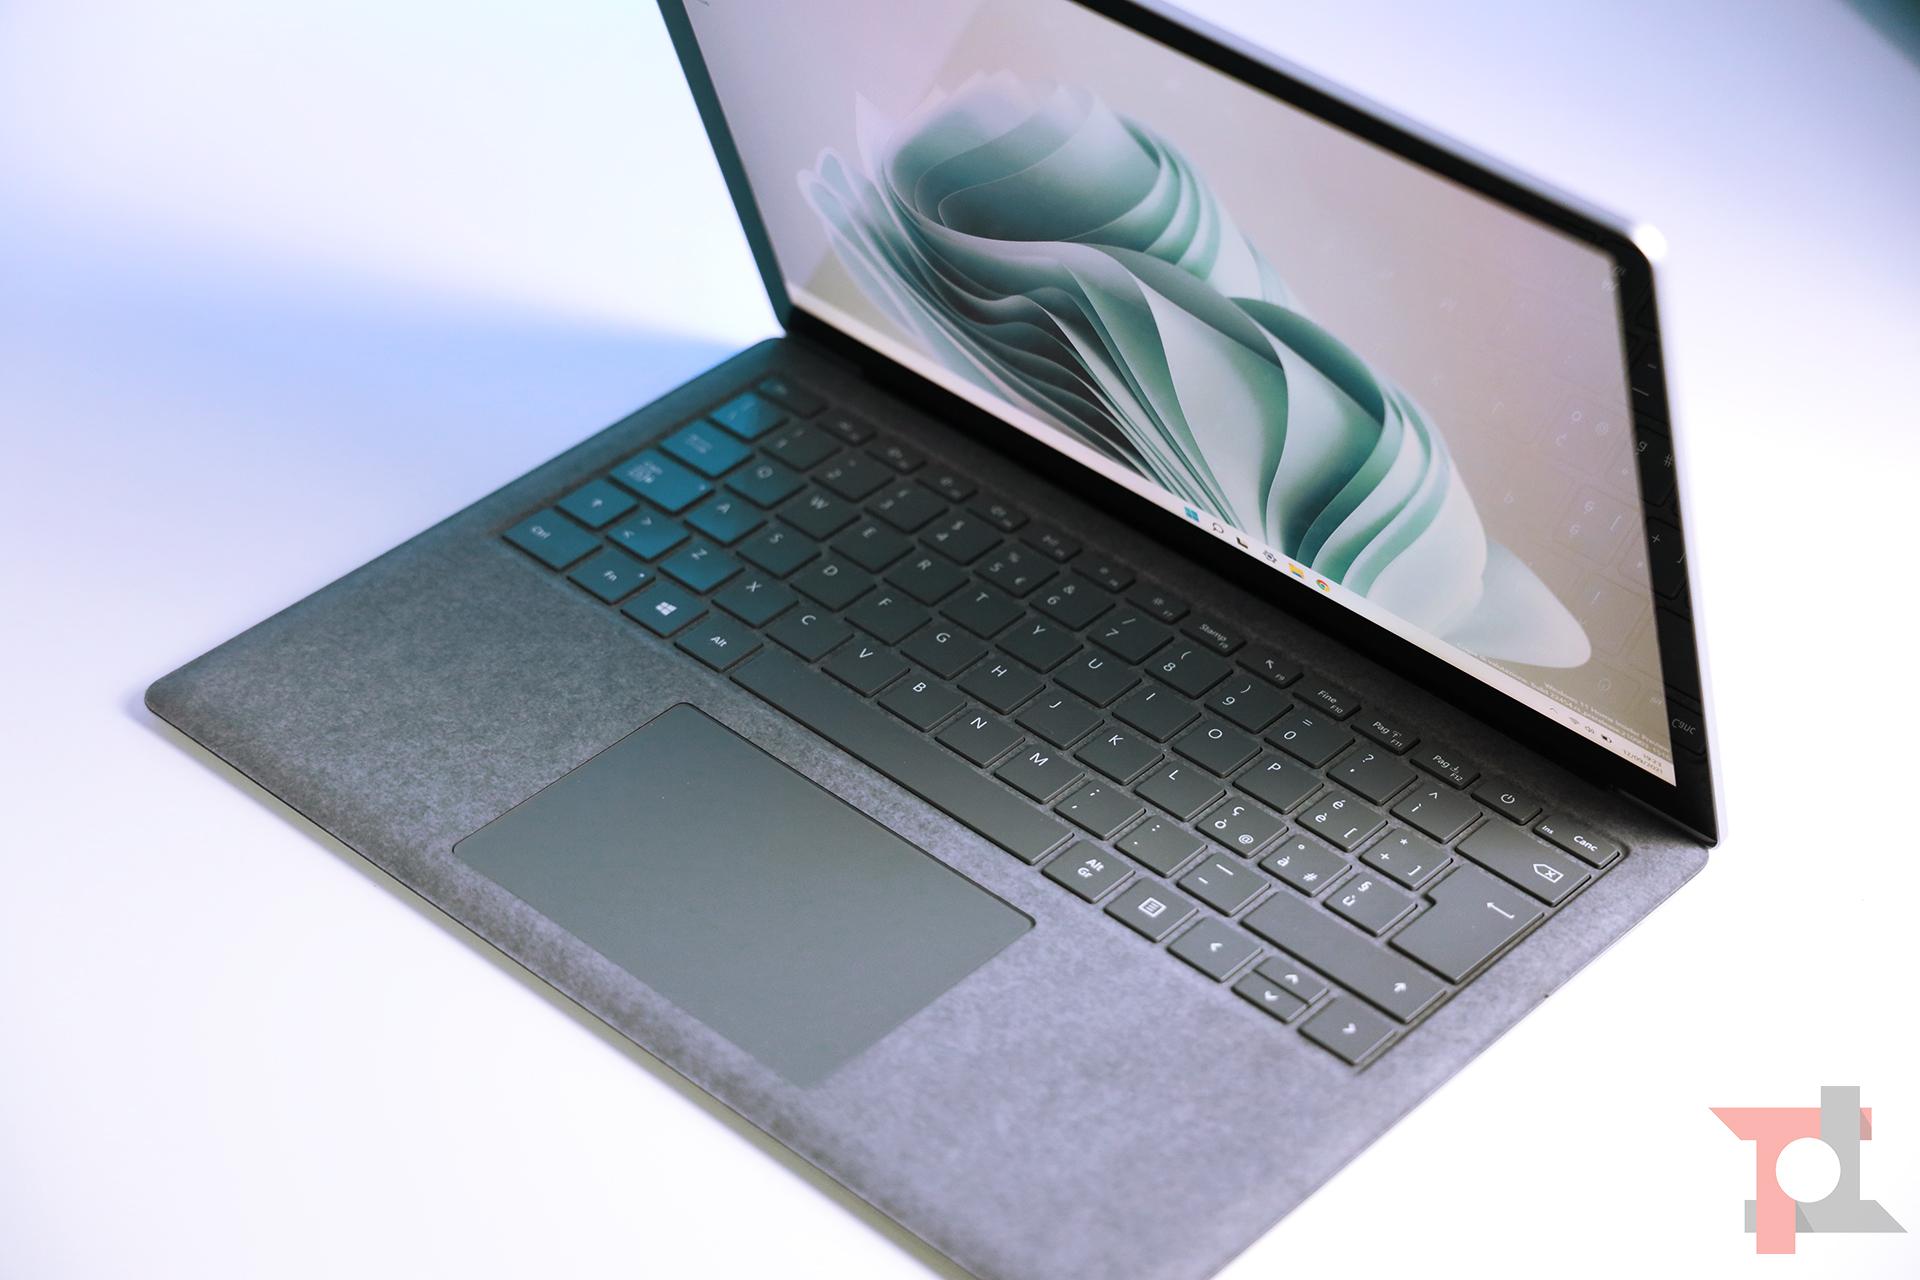 Surface Laptop 4 Windows 11 prestazioni